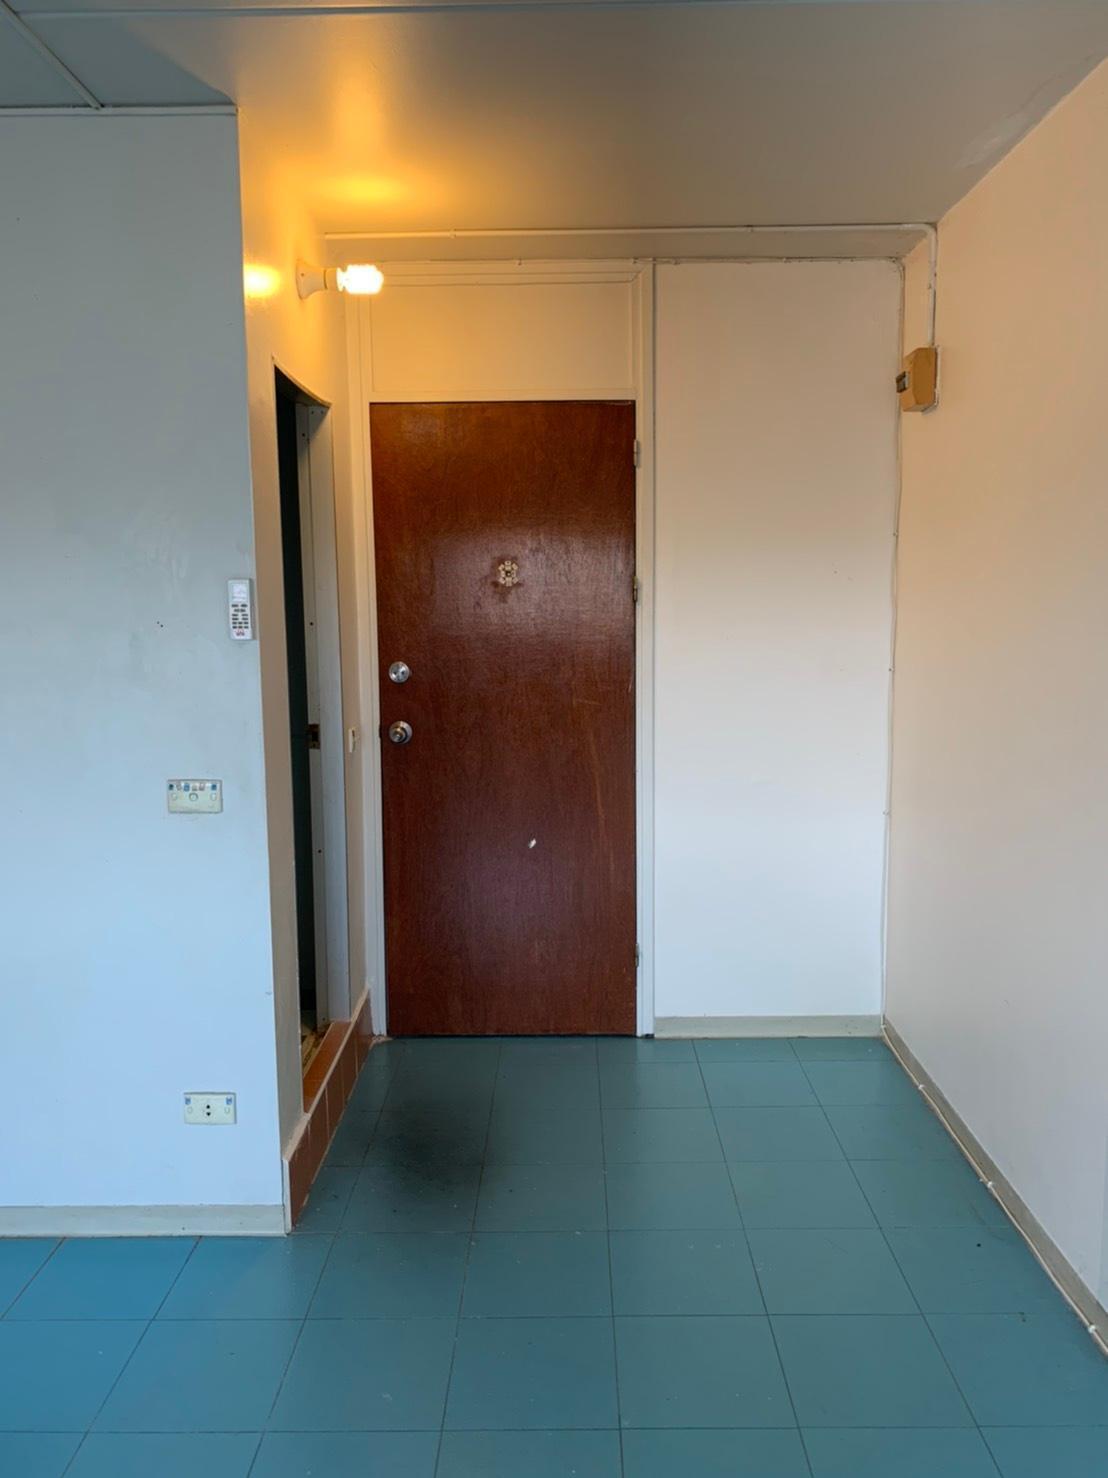 Popular Condo Muang Thong Thani อพาร์ตเมนต์ 1 ห้องนอน 1 ห้องน้ำส่วนตัว ขนาด 28 ตร.ม. – สนามบินนานาชาติดอนเมือง